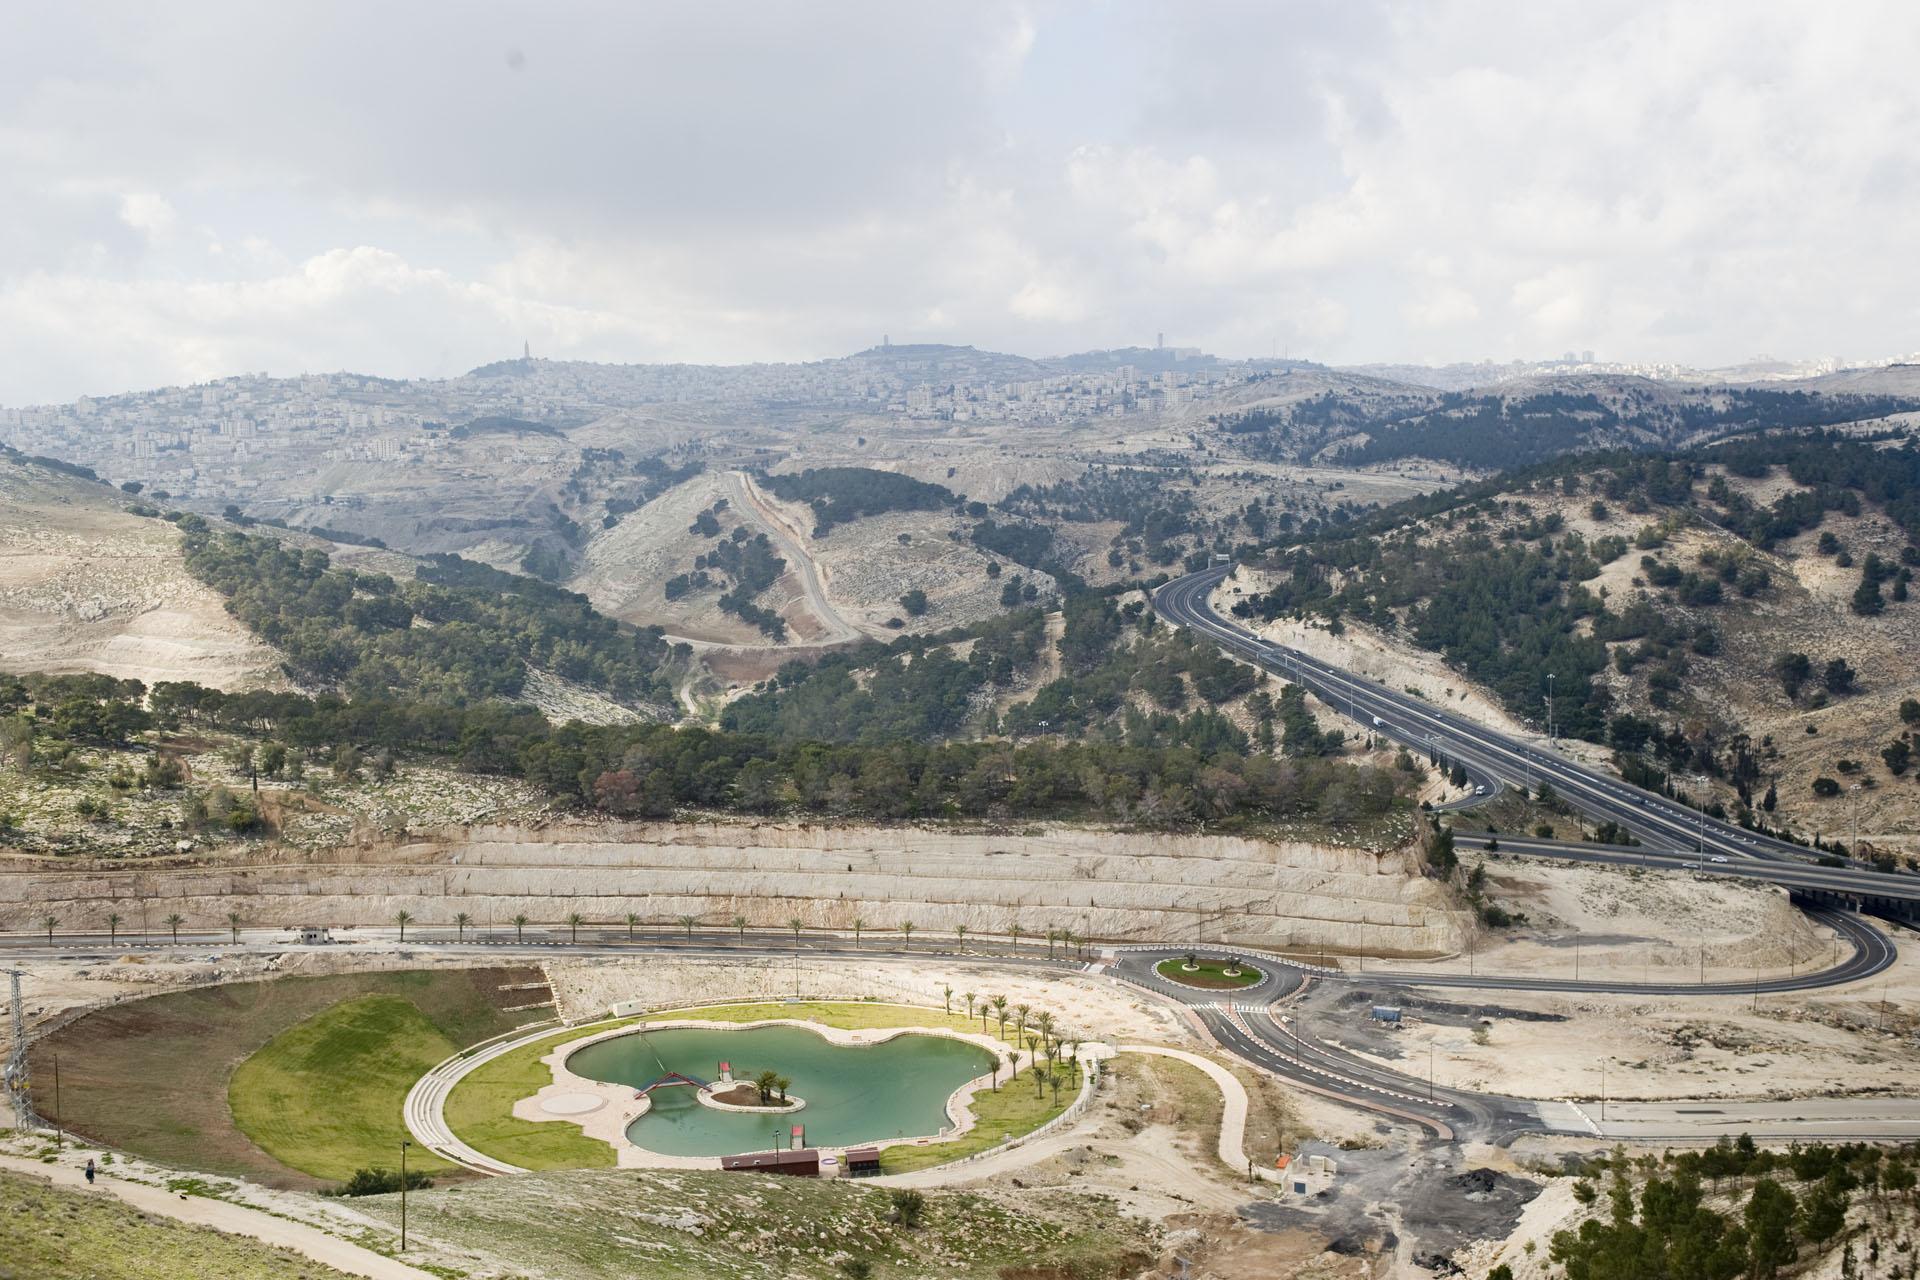 ICAHD / MAYAALTERNATIVE TOUR OF EAST JERUSALEM